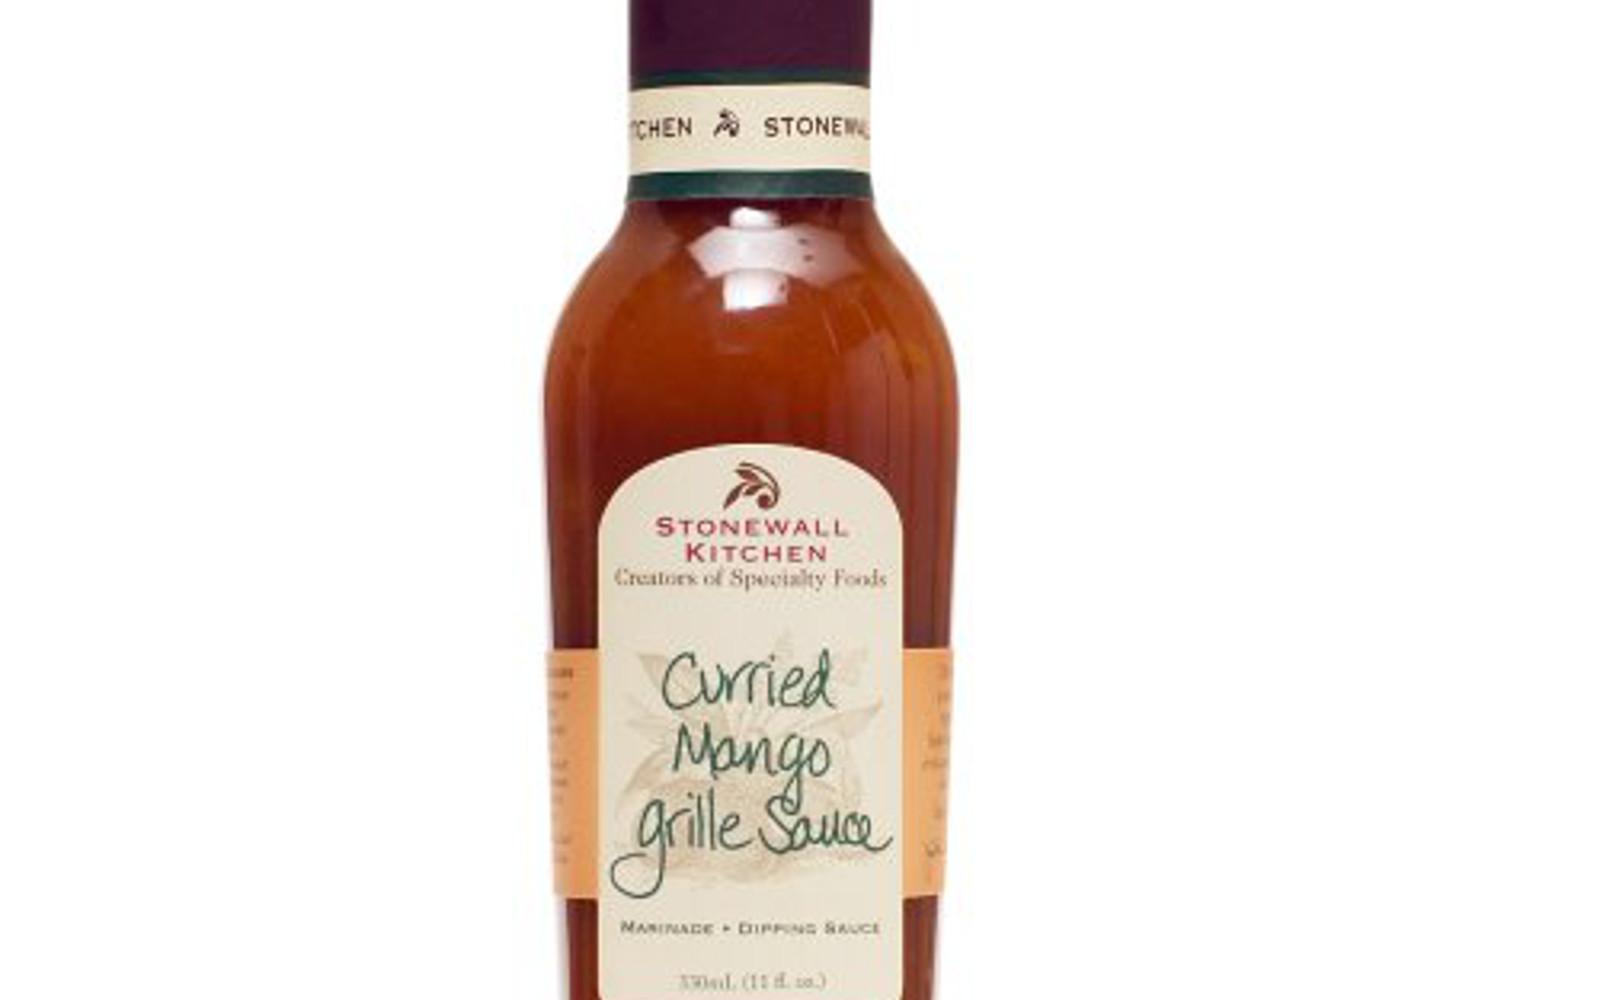 Stonewall Kitchen Mango Grille Sauce